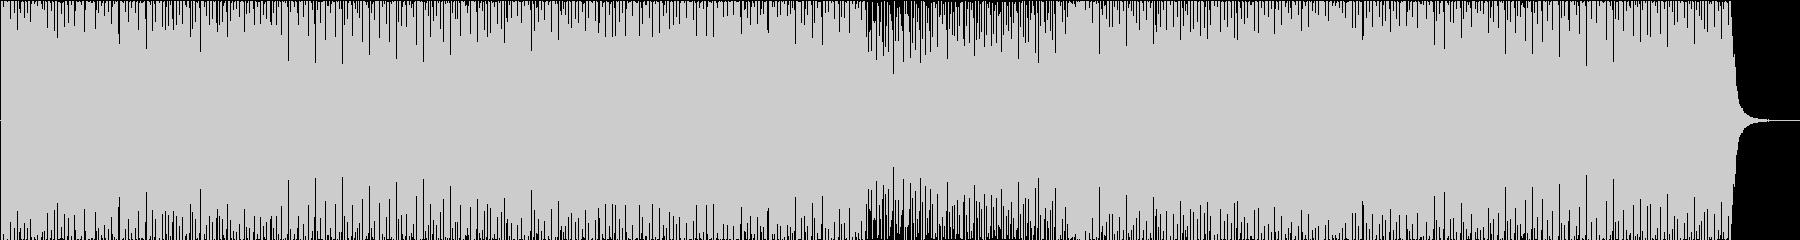 EDM系BGM(途中ボーカルあり)の未再生の波形